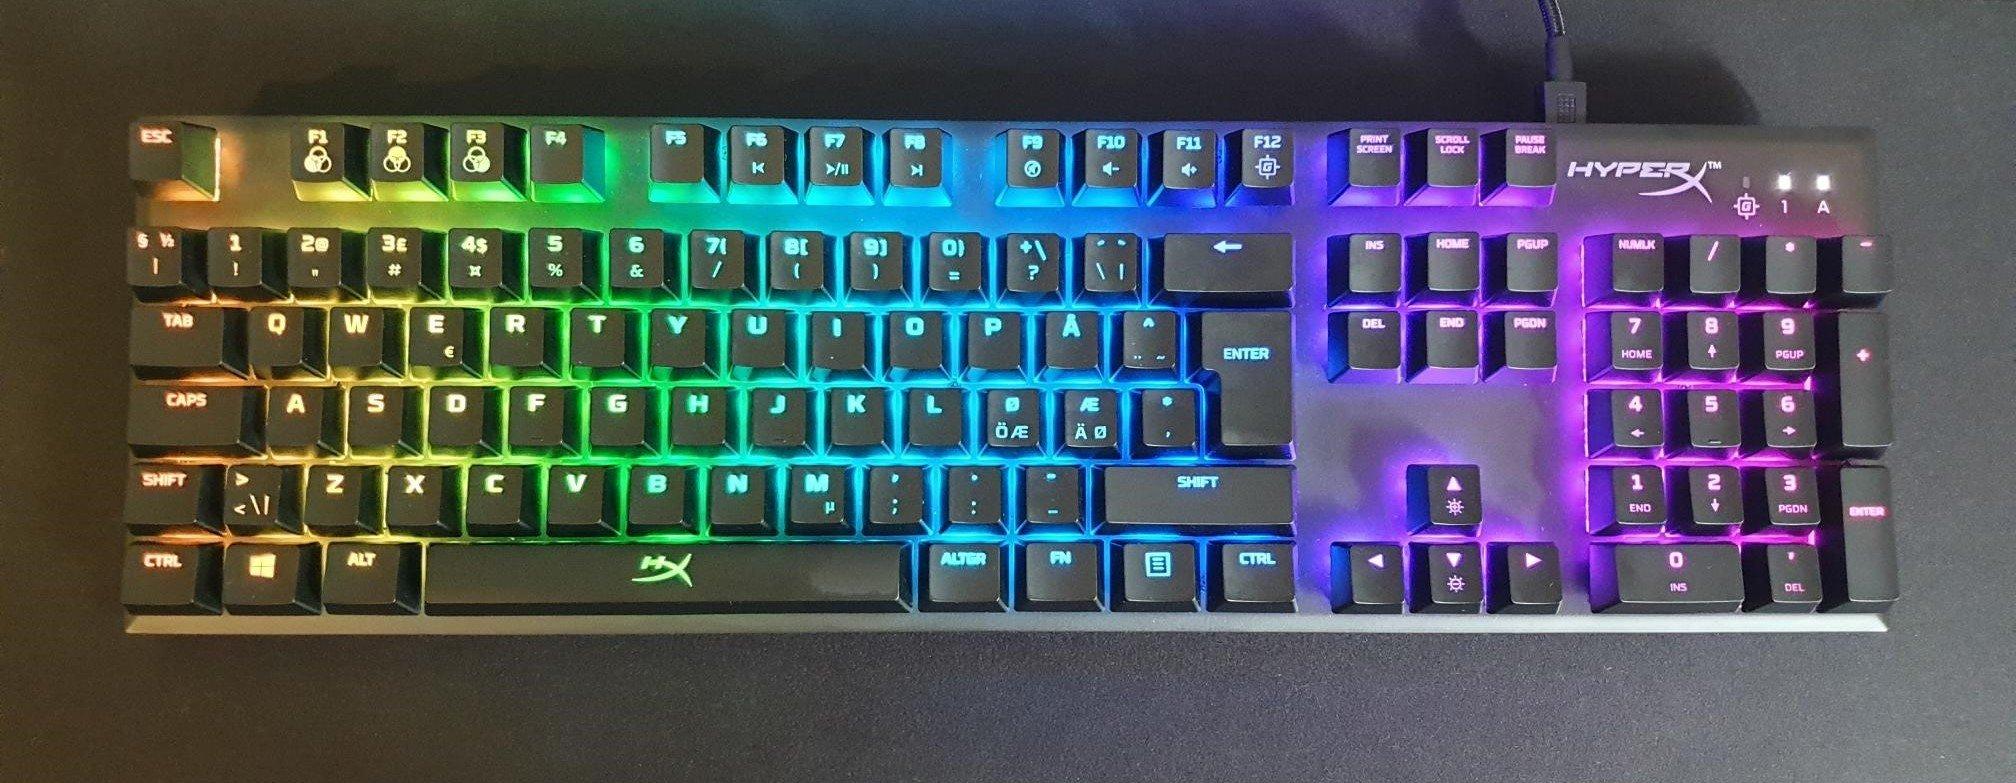 Image of my own HyperX mechanical keyboard